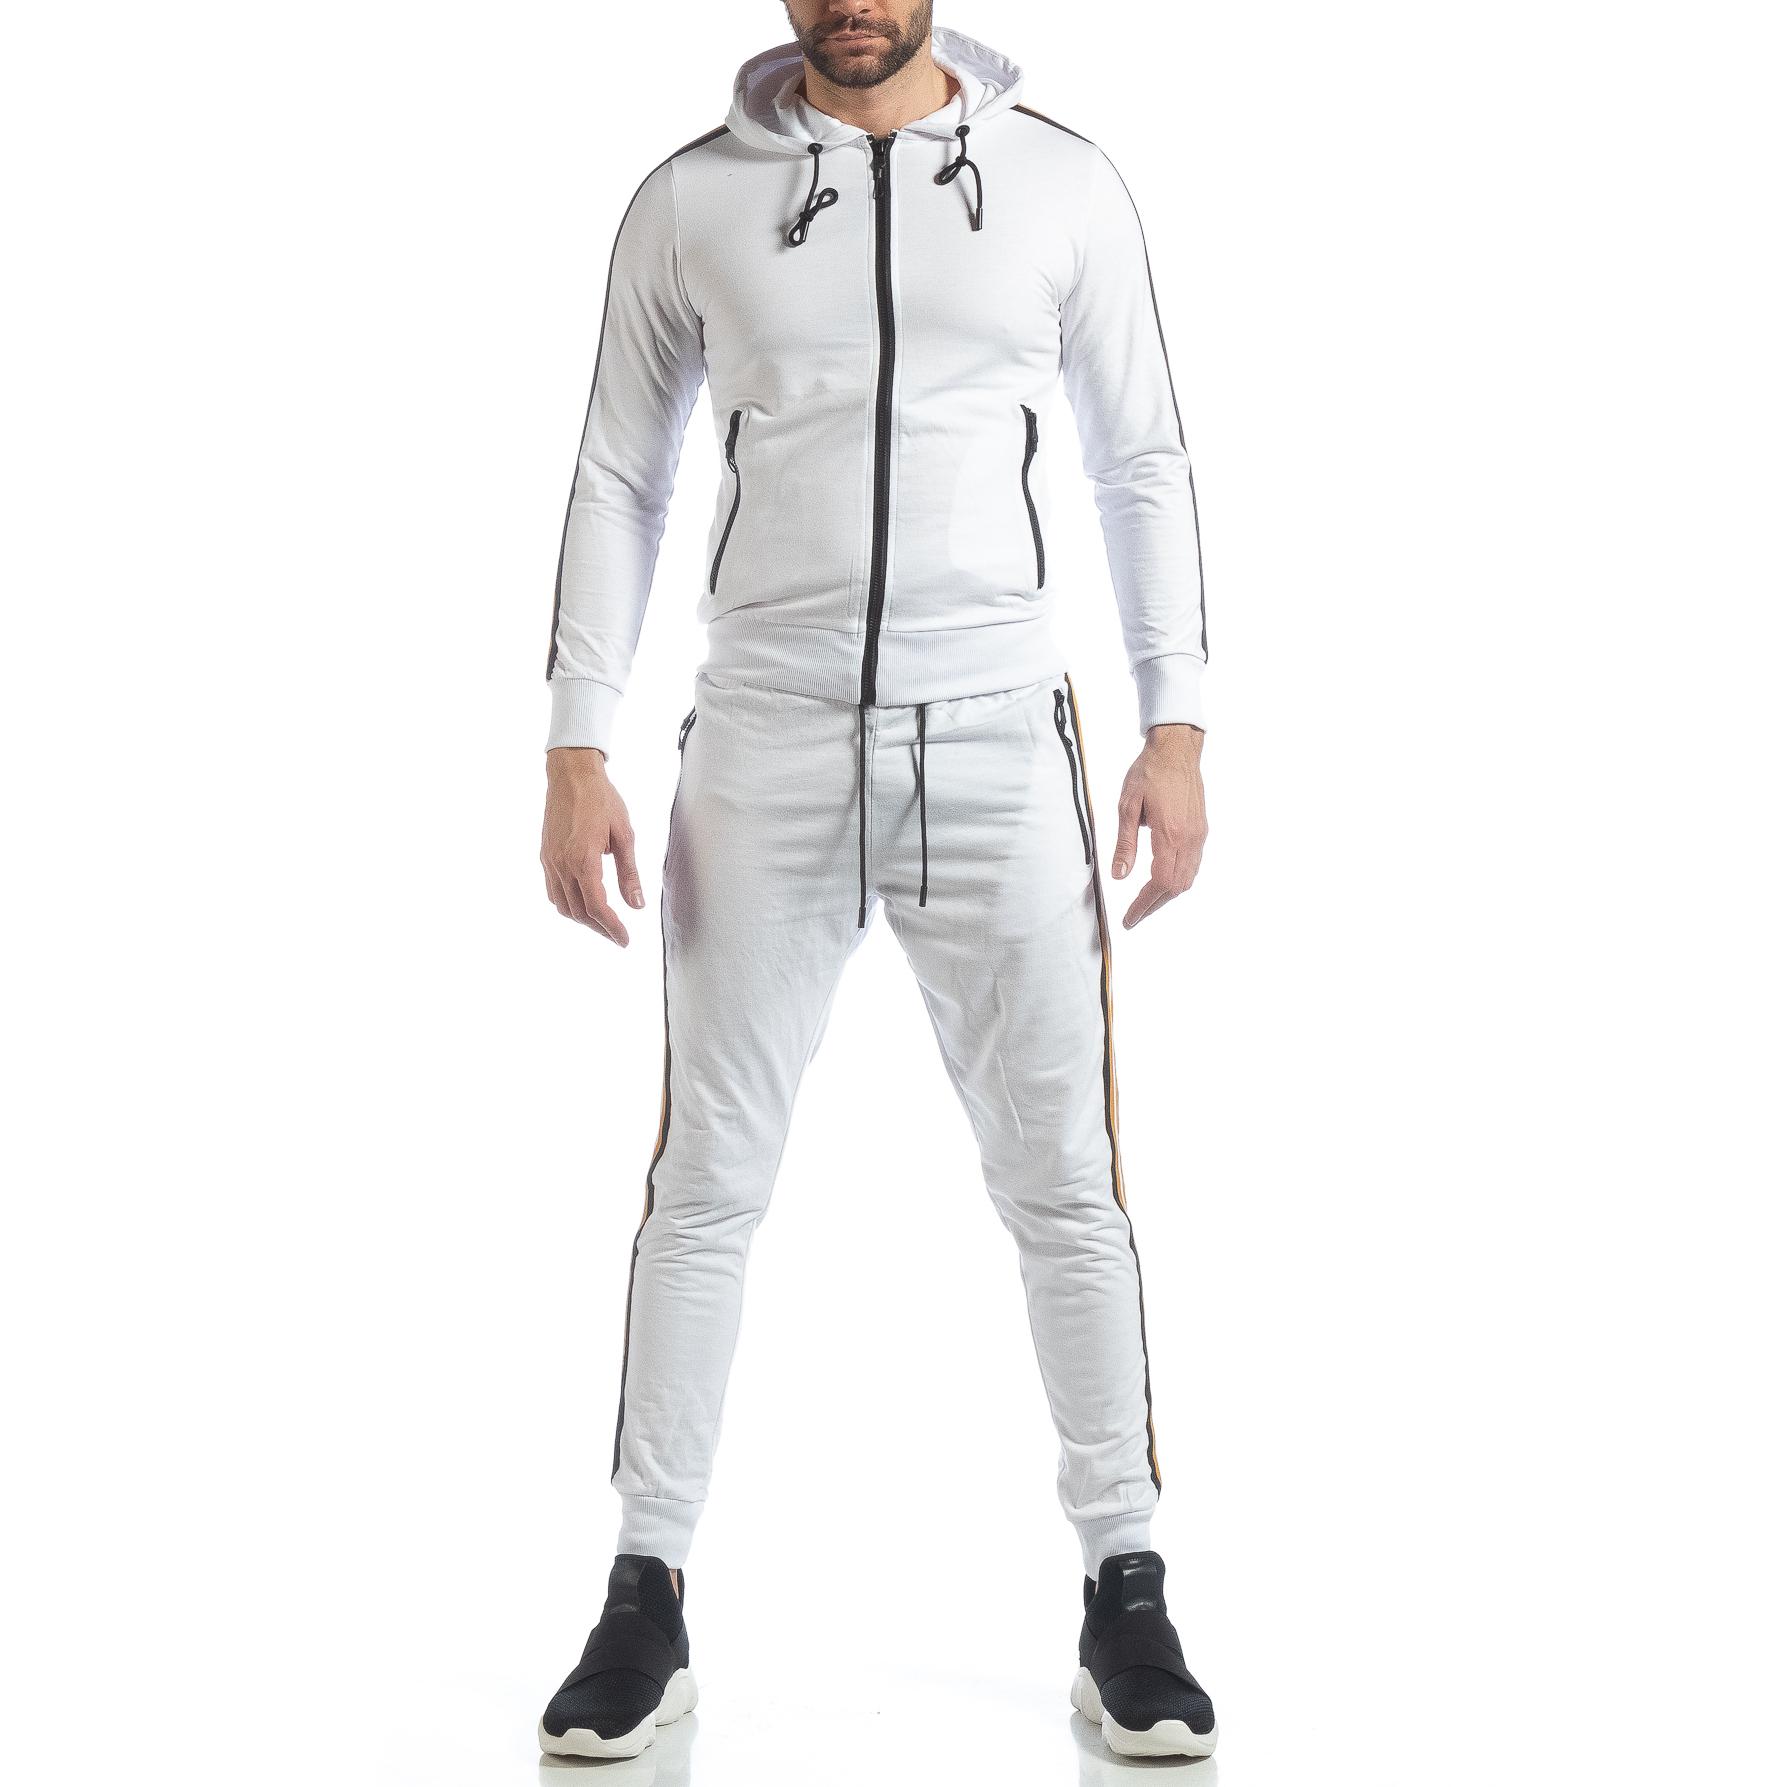 e54ae2dba6b Ανδρικά Ρούχα, Ανδρικά Αθλητικά Ρούχα